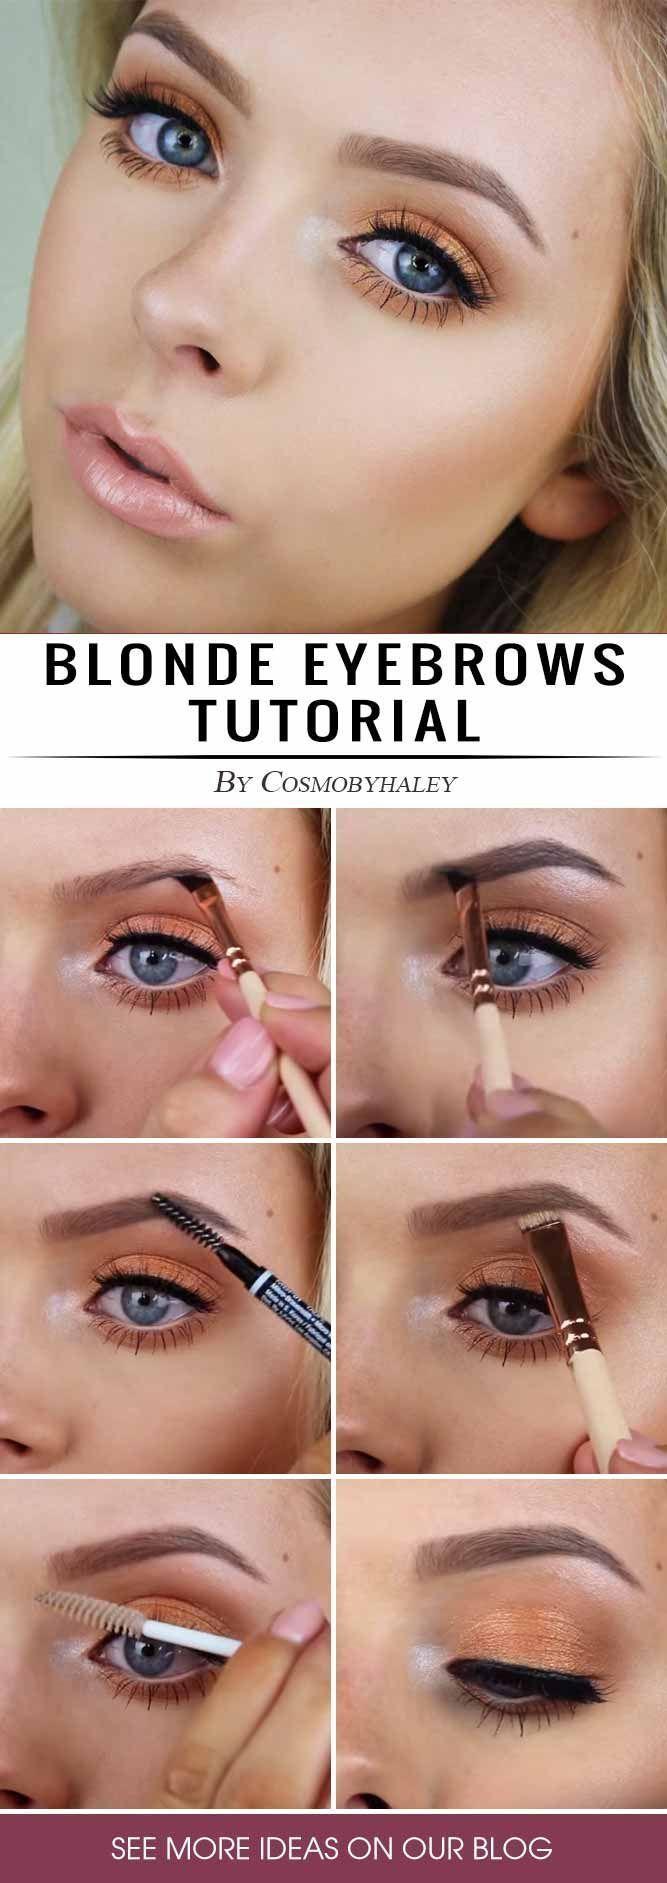 Blonde Eyebrows Tutorial: How To Get Fuller, Natural ...